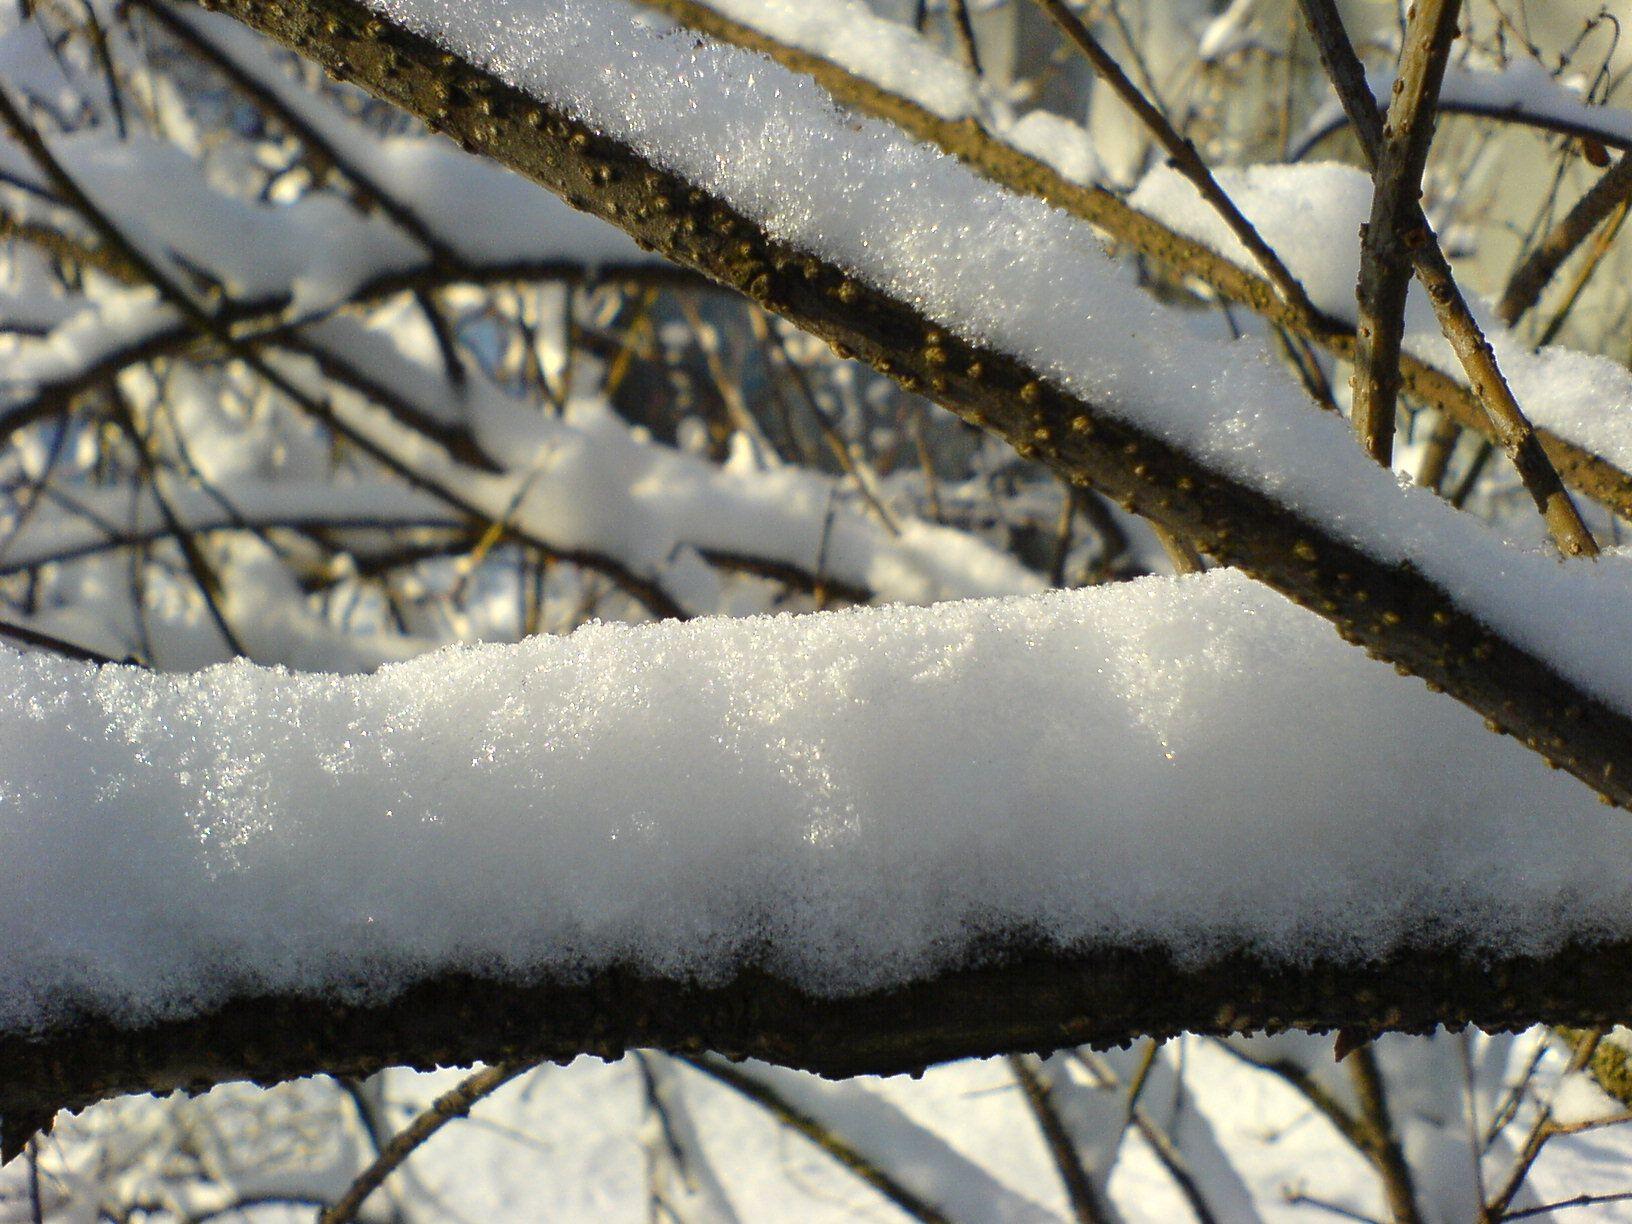 Snow Wikipedia, the free encyclopedia American poets